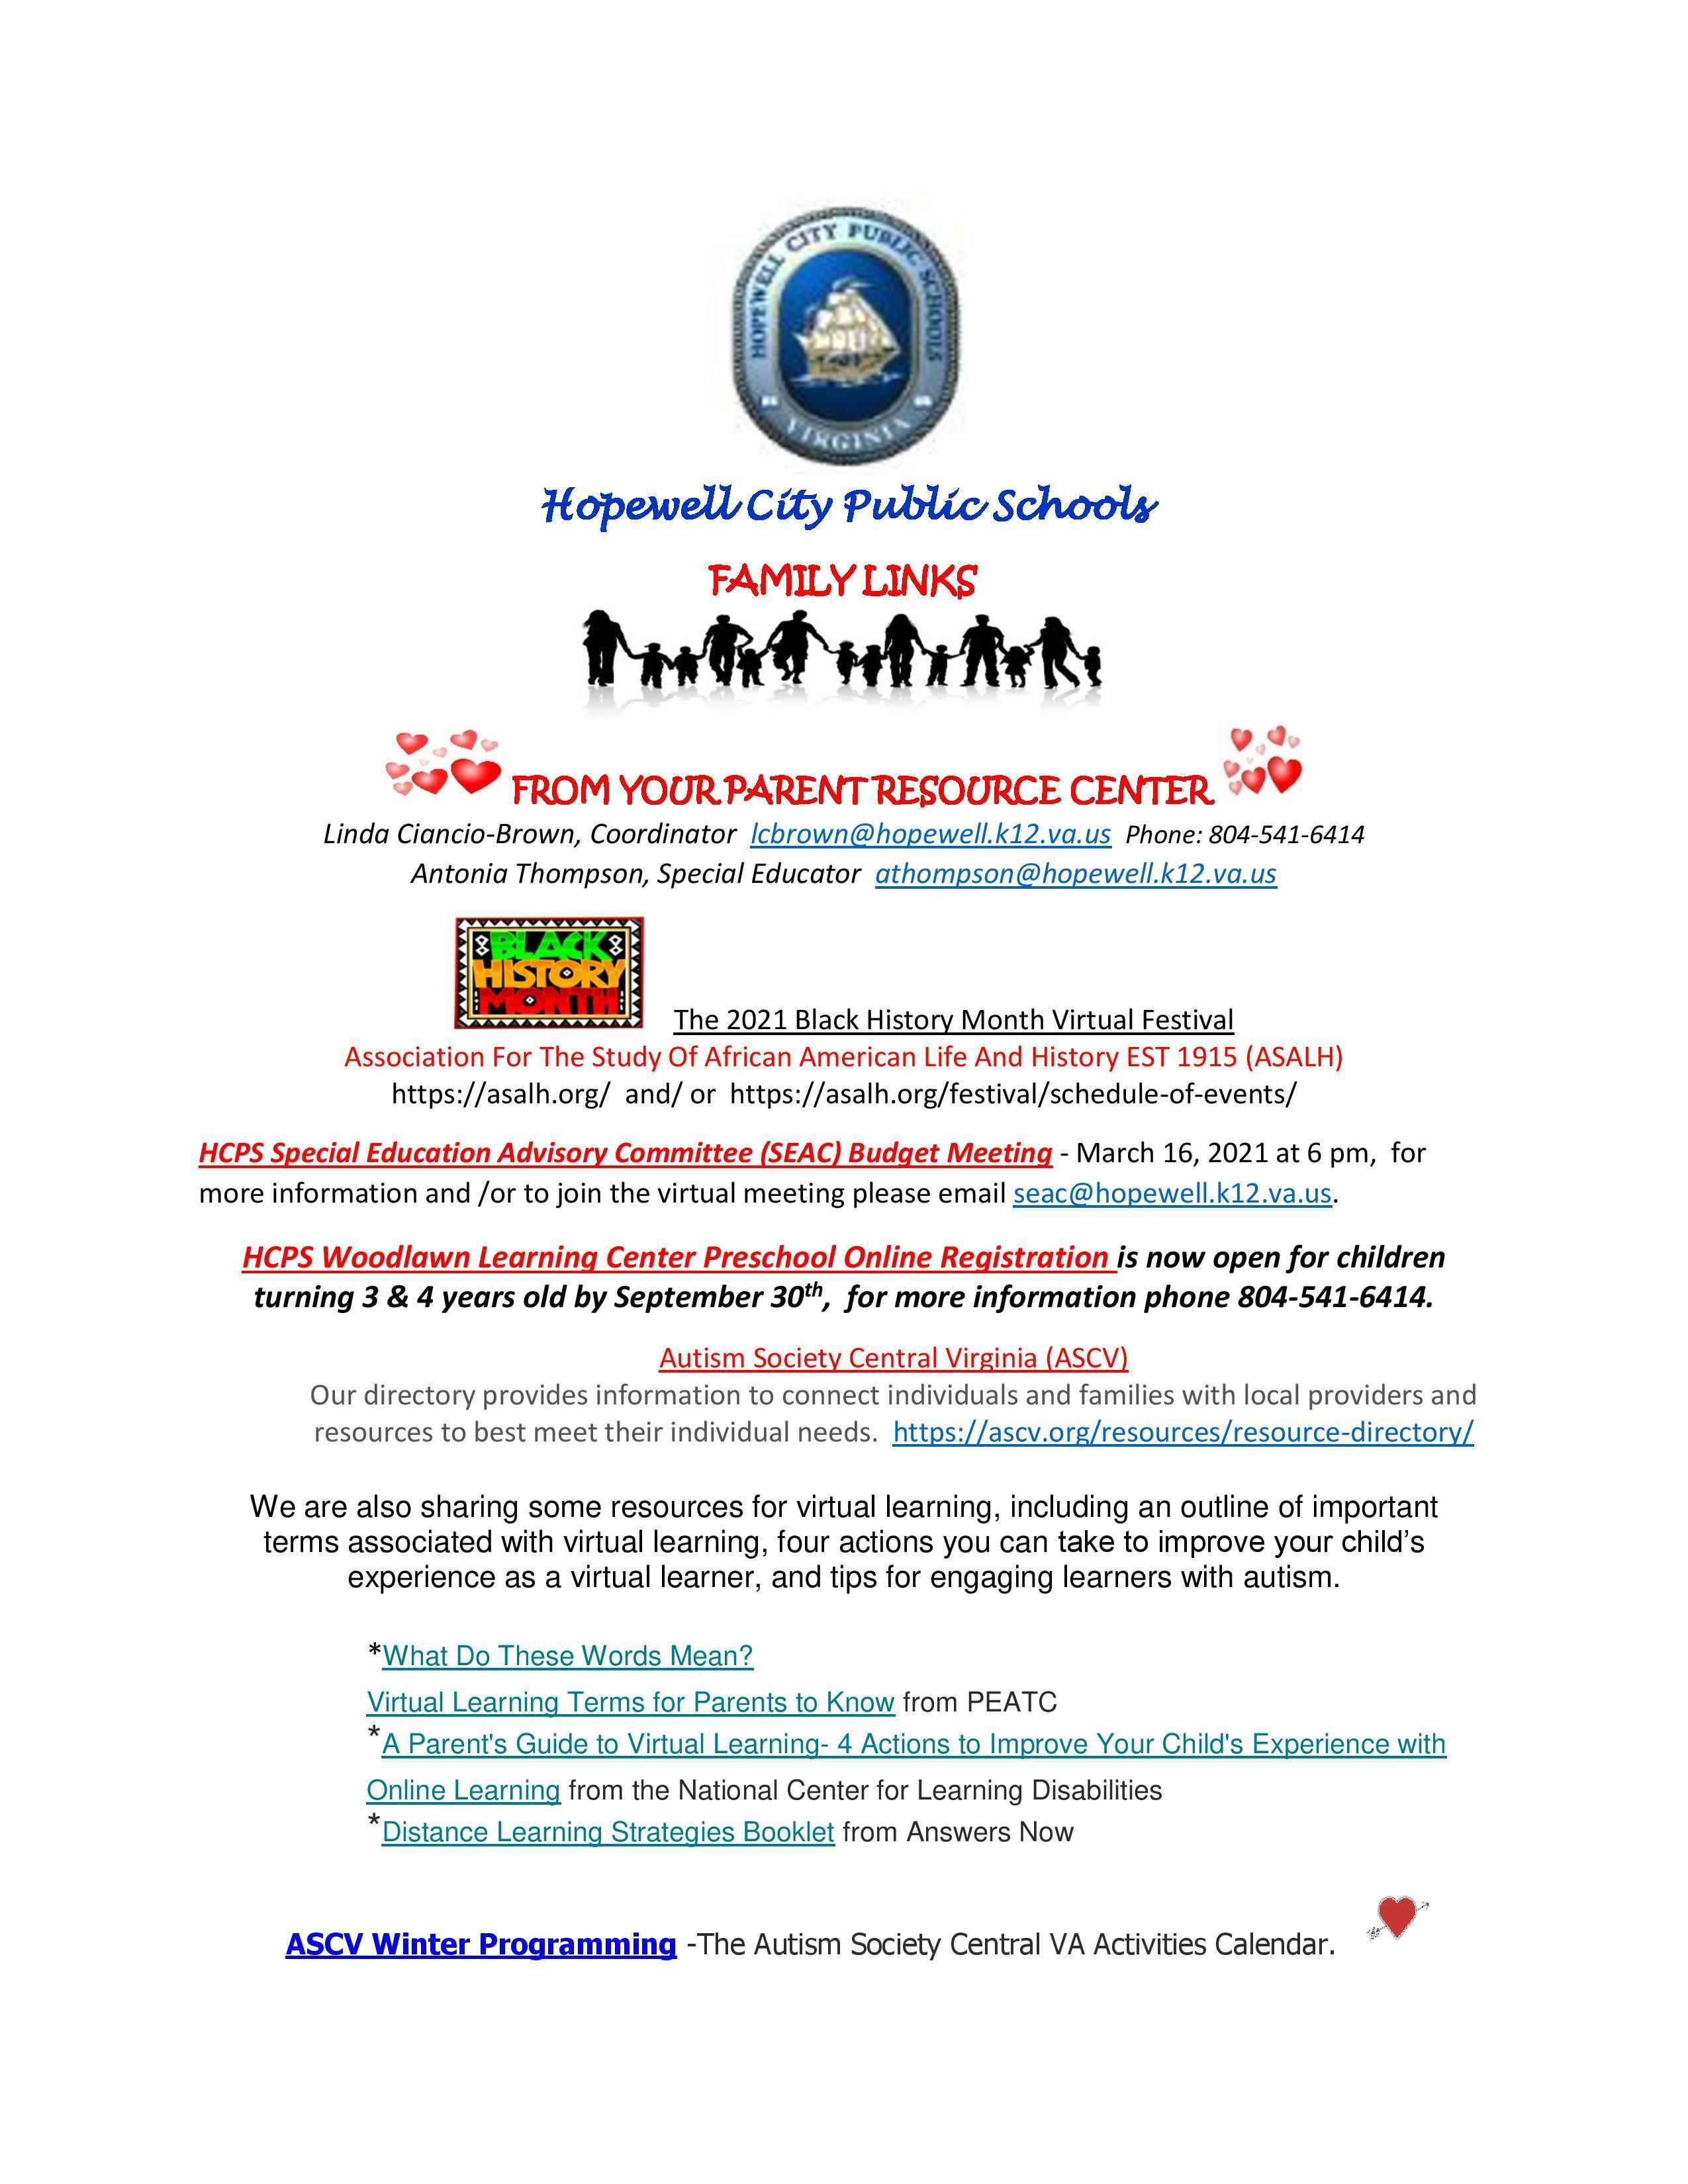 Information regarding links for Parent Resources